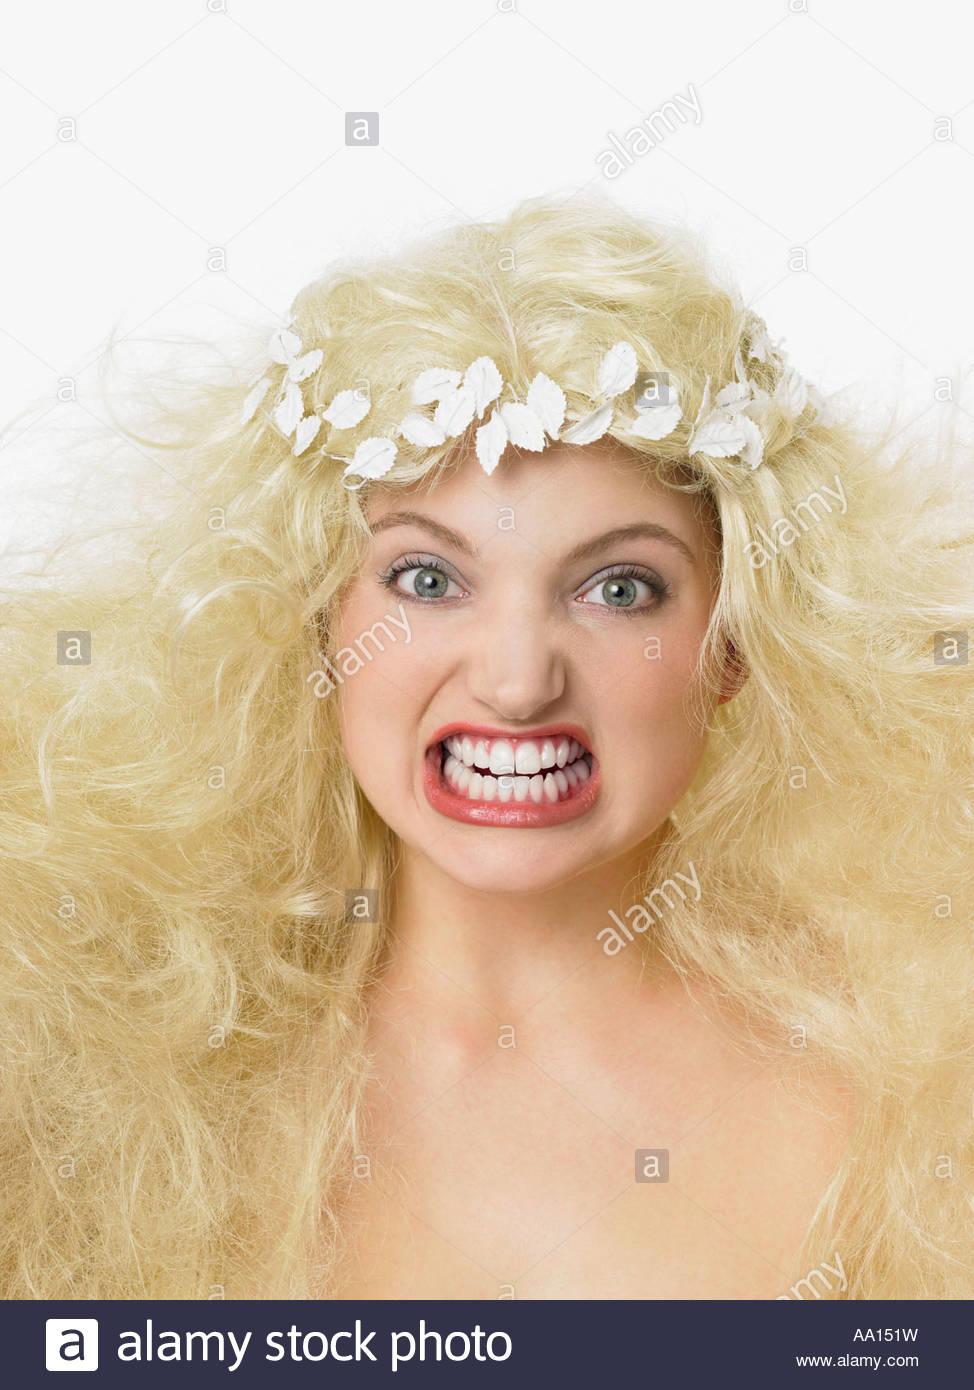 Woman grimacing - Stock Image